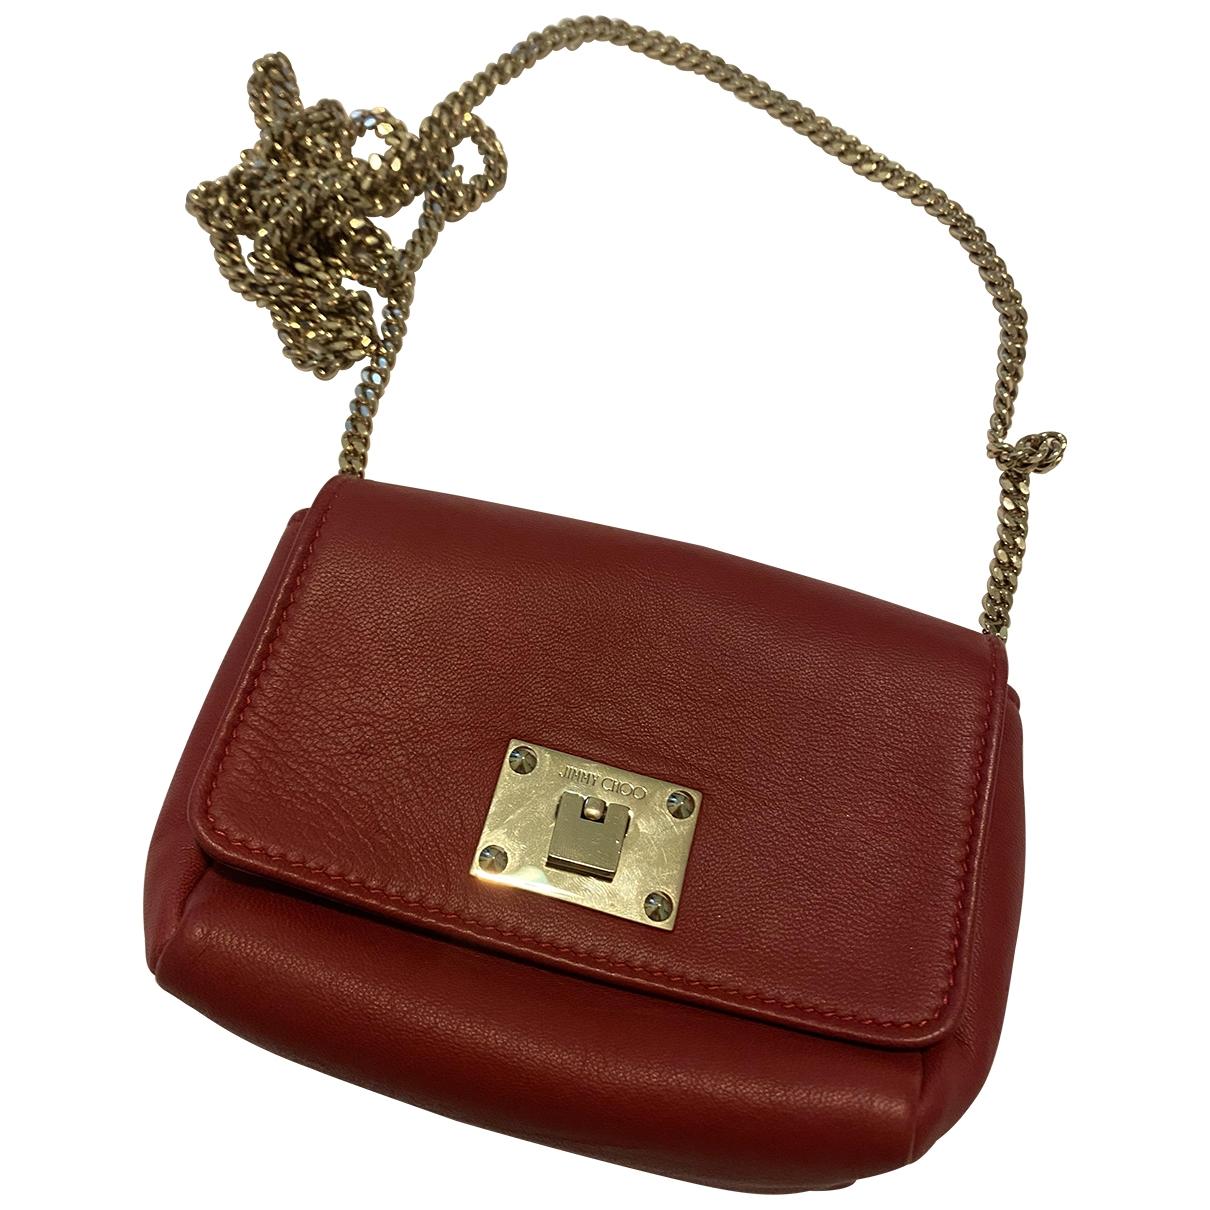 Jimmy Choo \N Handtasche in  Bordeauxrot Leder